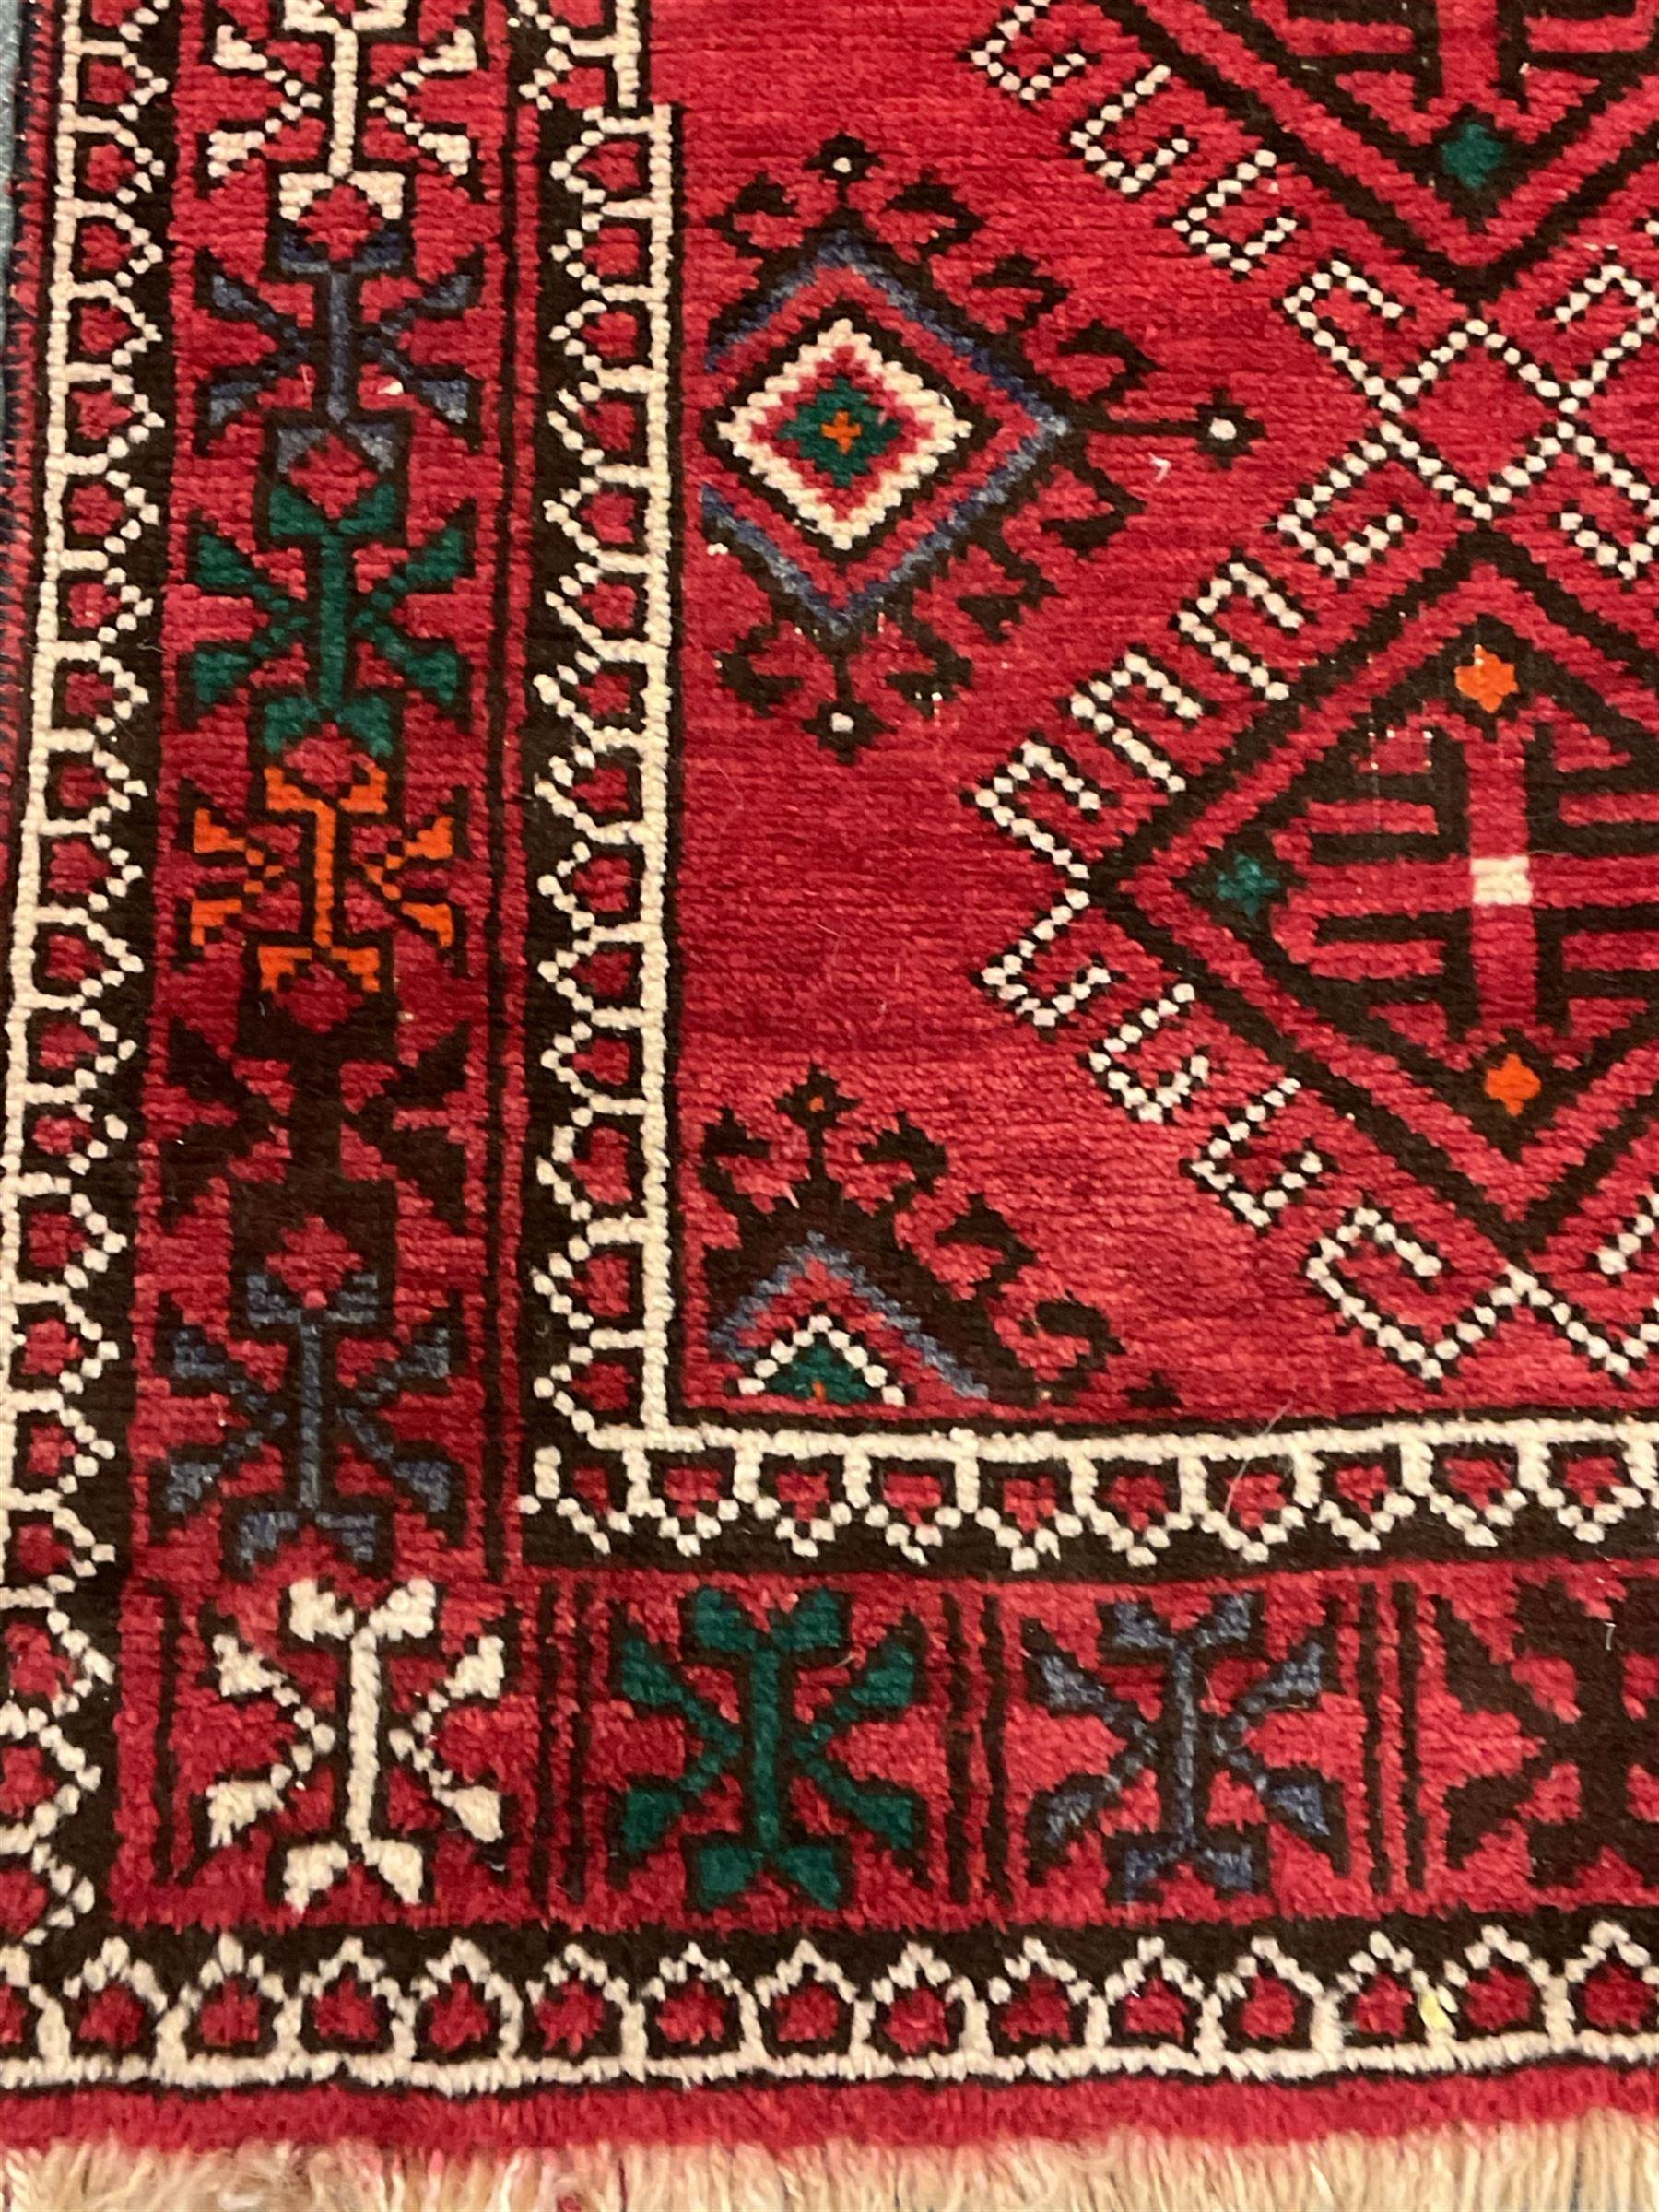 Turkish red ground rug - Image 2 of 4